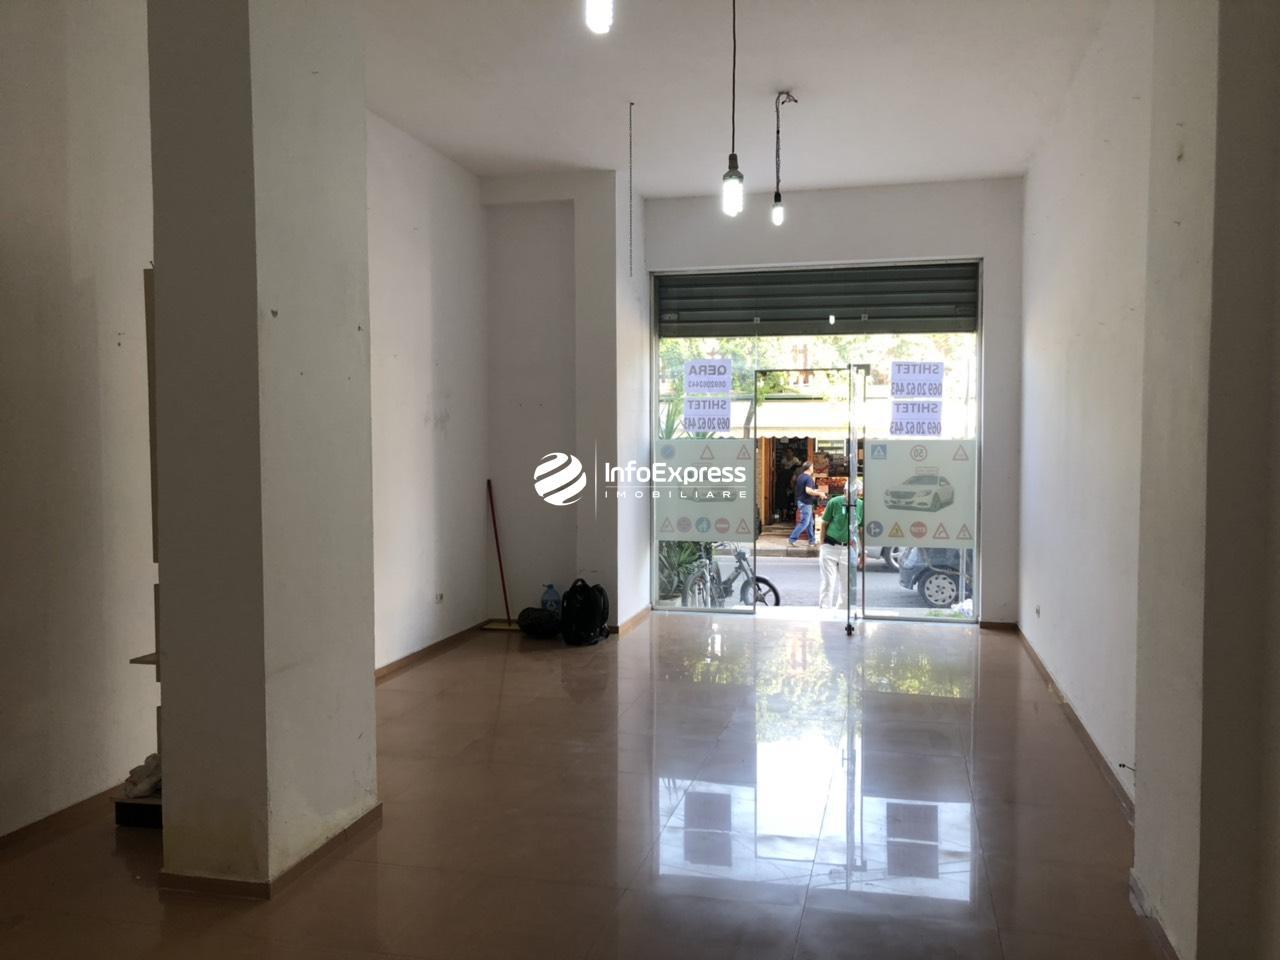 TRR-0618-1357 Jepet me qera dyqan prane gjimnazit Partizani , Selvia